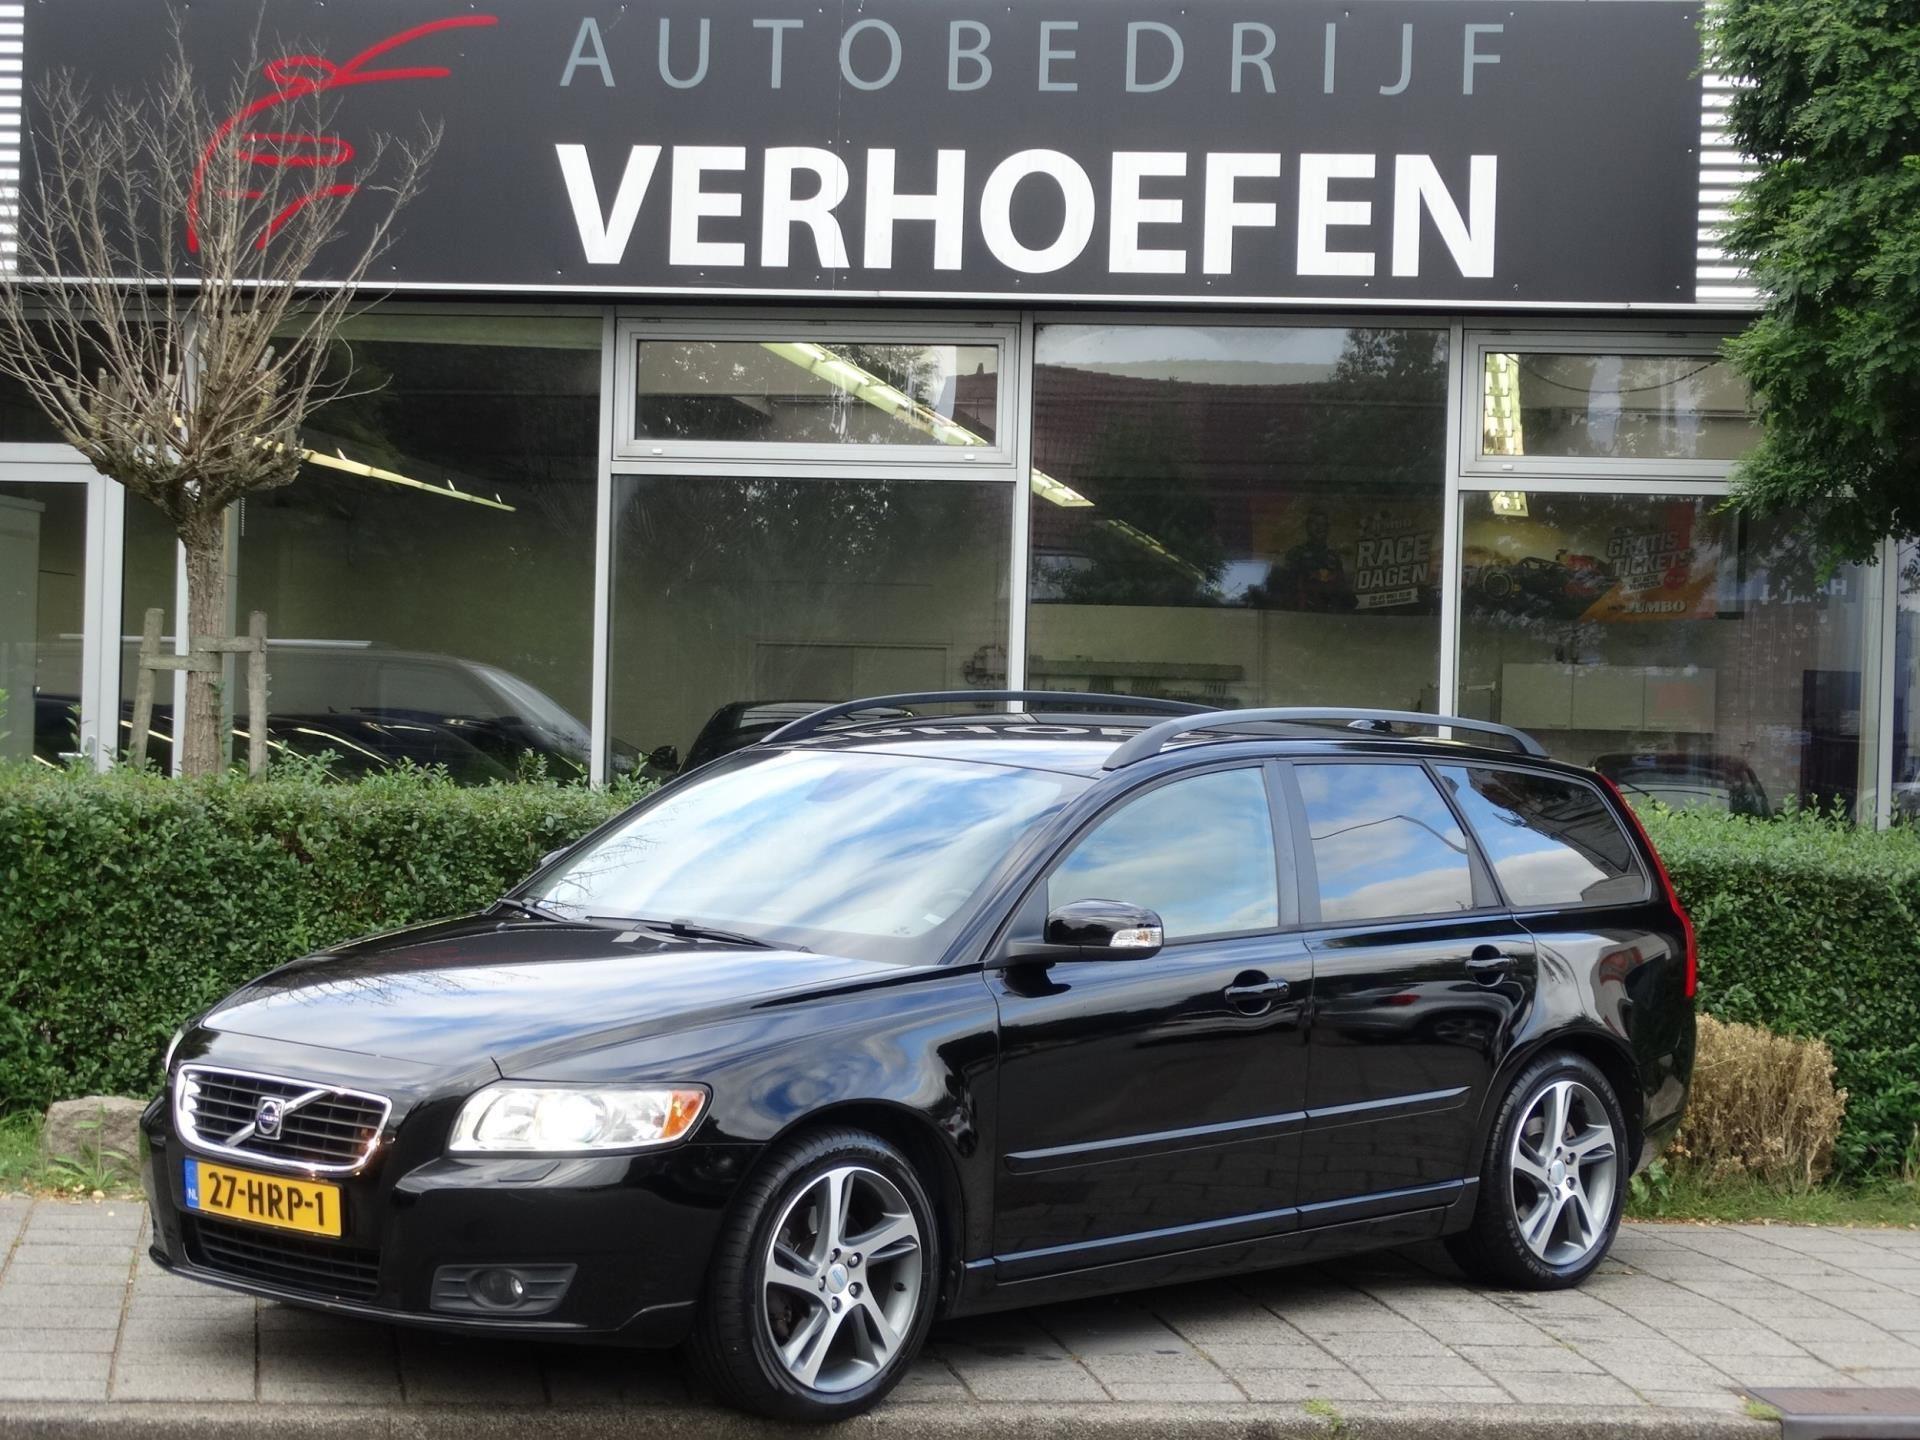 Volvo V50 occasion - Autobedrijf Verhoefen